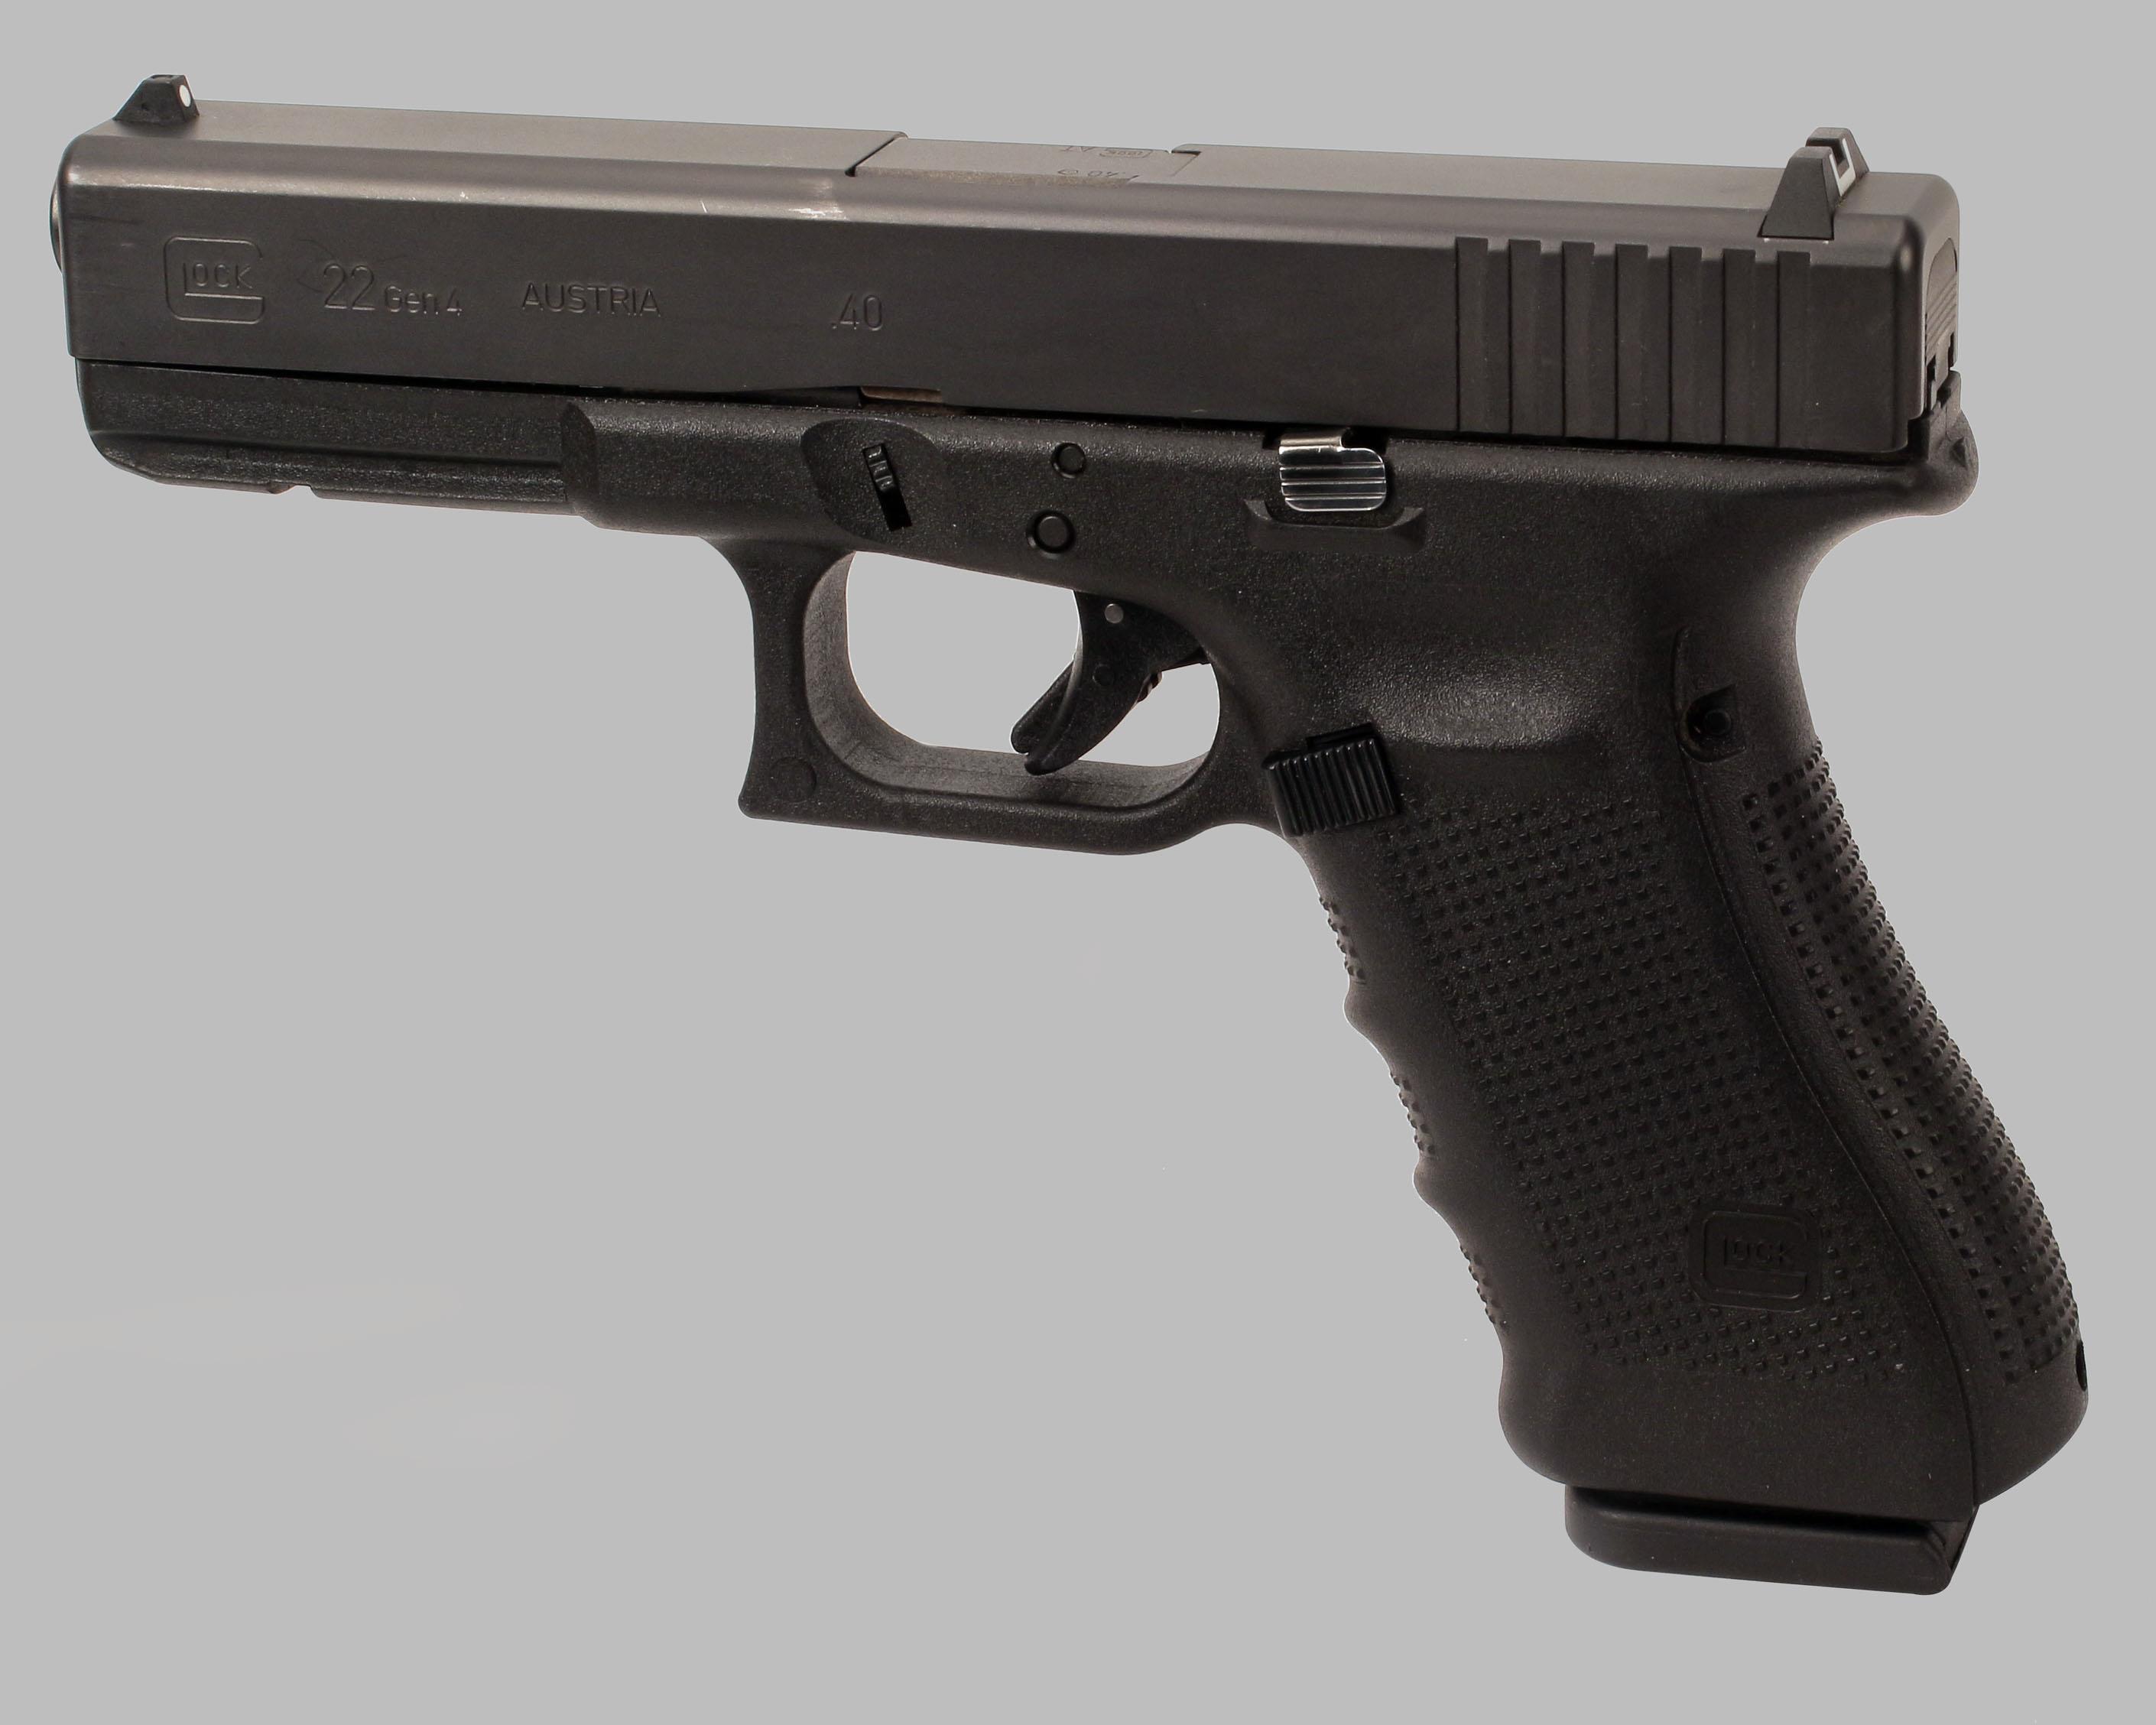 Glock 22 Pistol 22 Pistol for sale